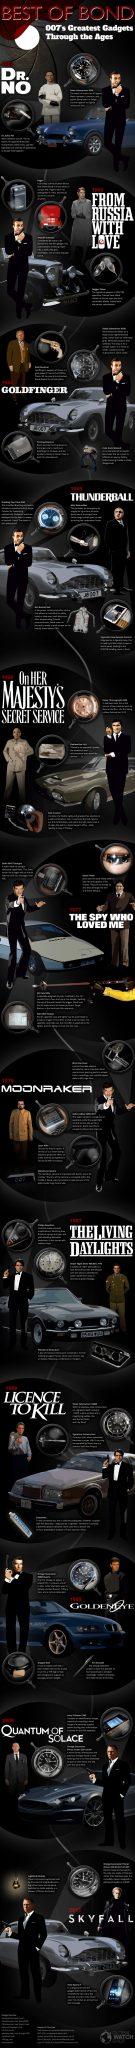 Best 007 Bond Gadgets - Infographic